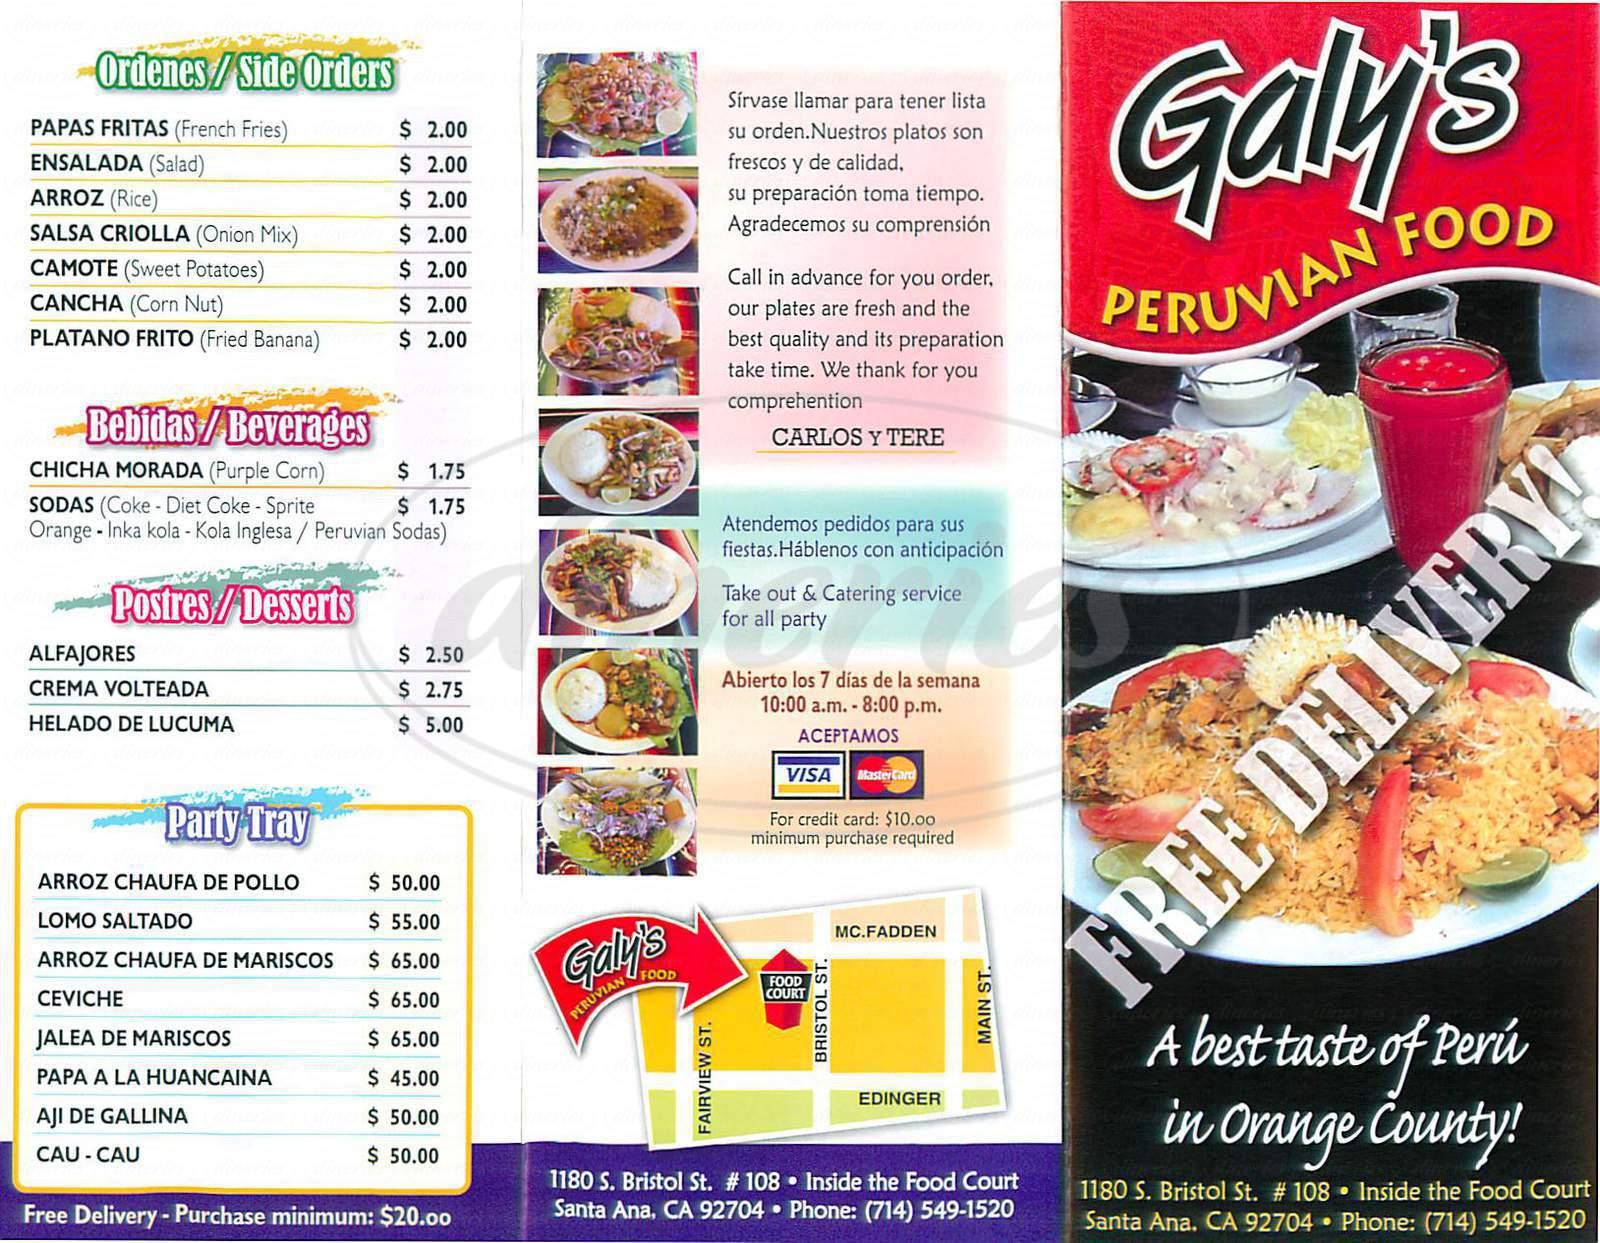 menu for Galy's Peruvian Food